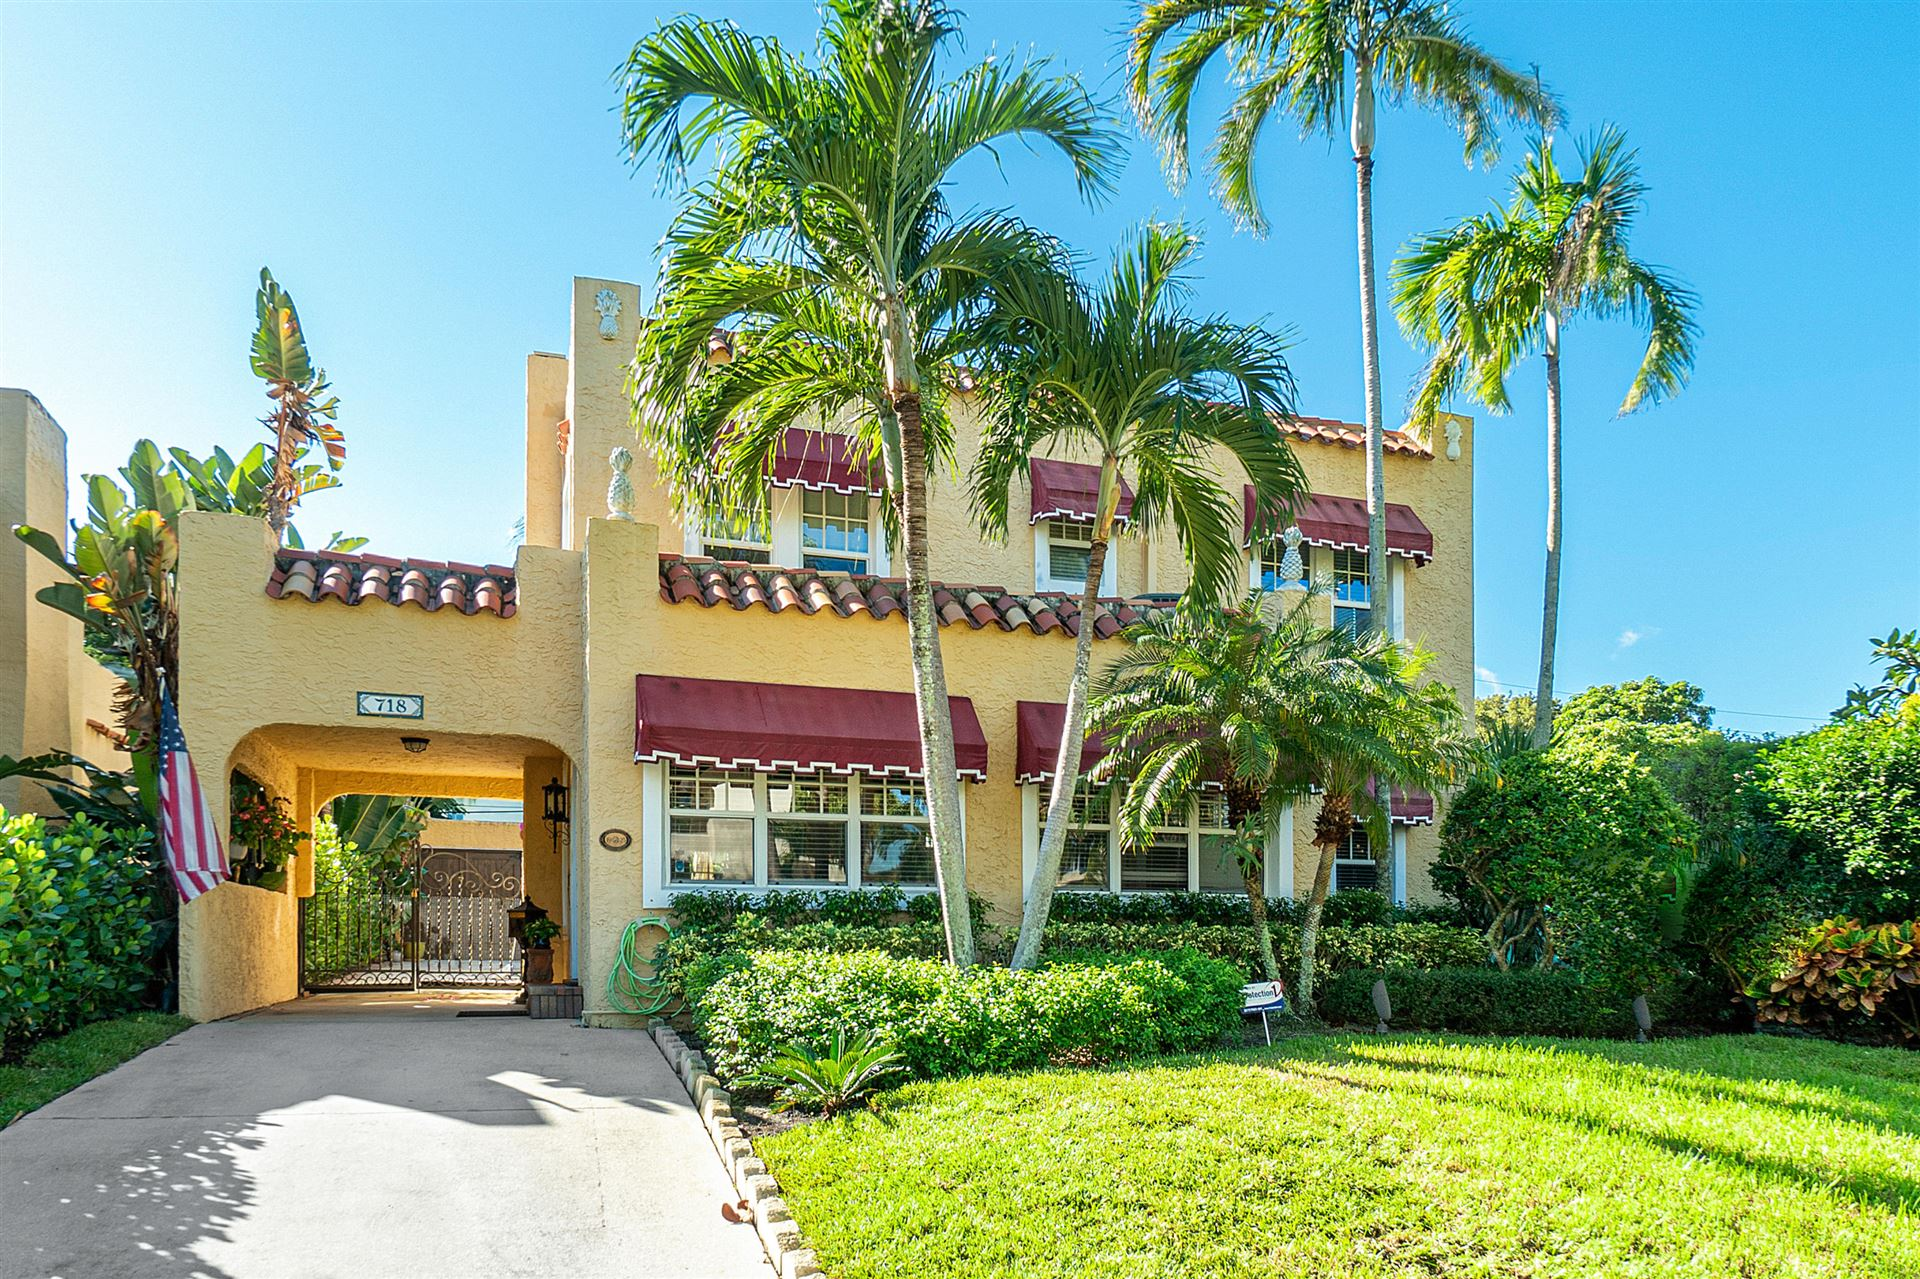 718 Biscayne Drive, West Palm Beach, FL 33401 - #: RX-10620186